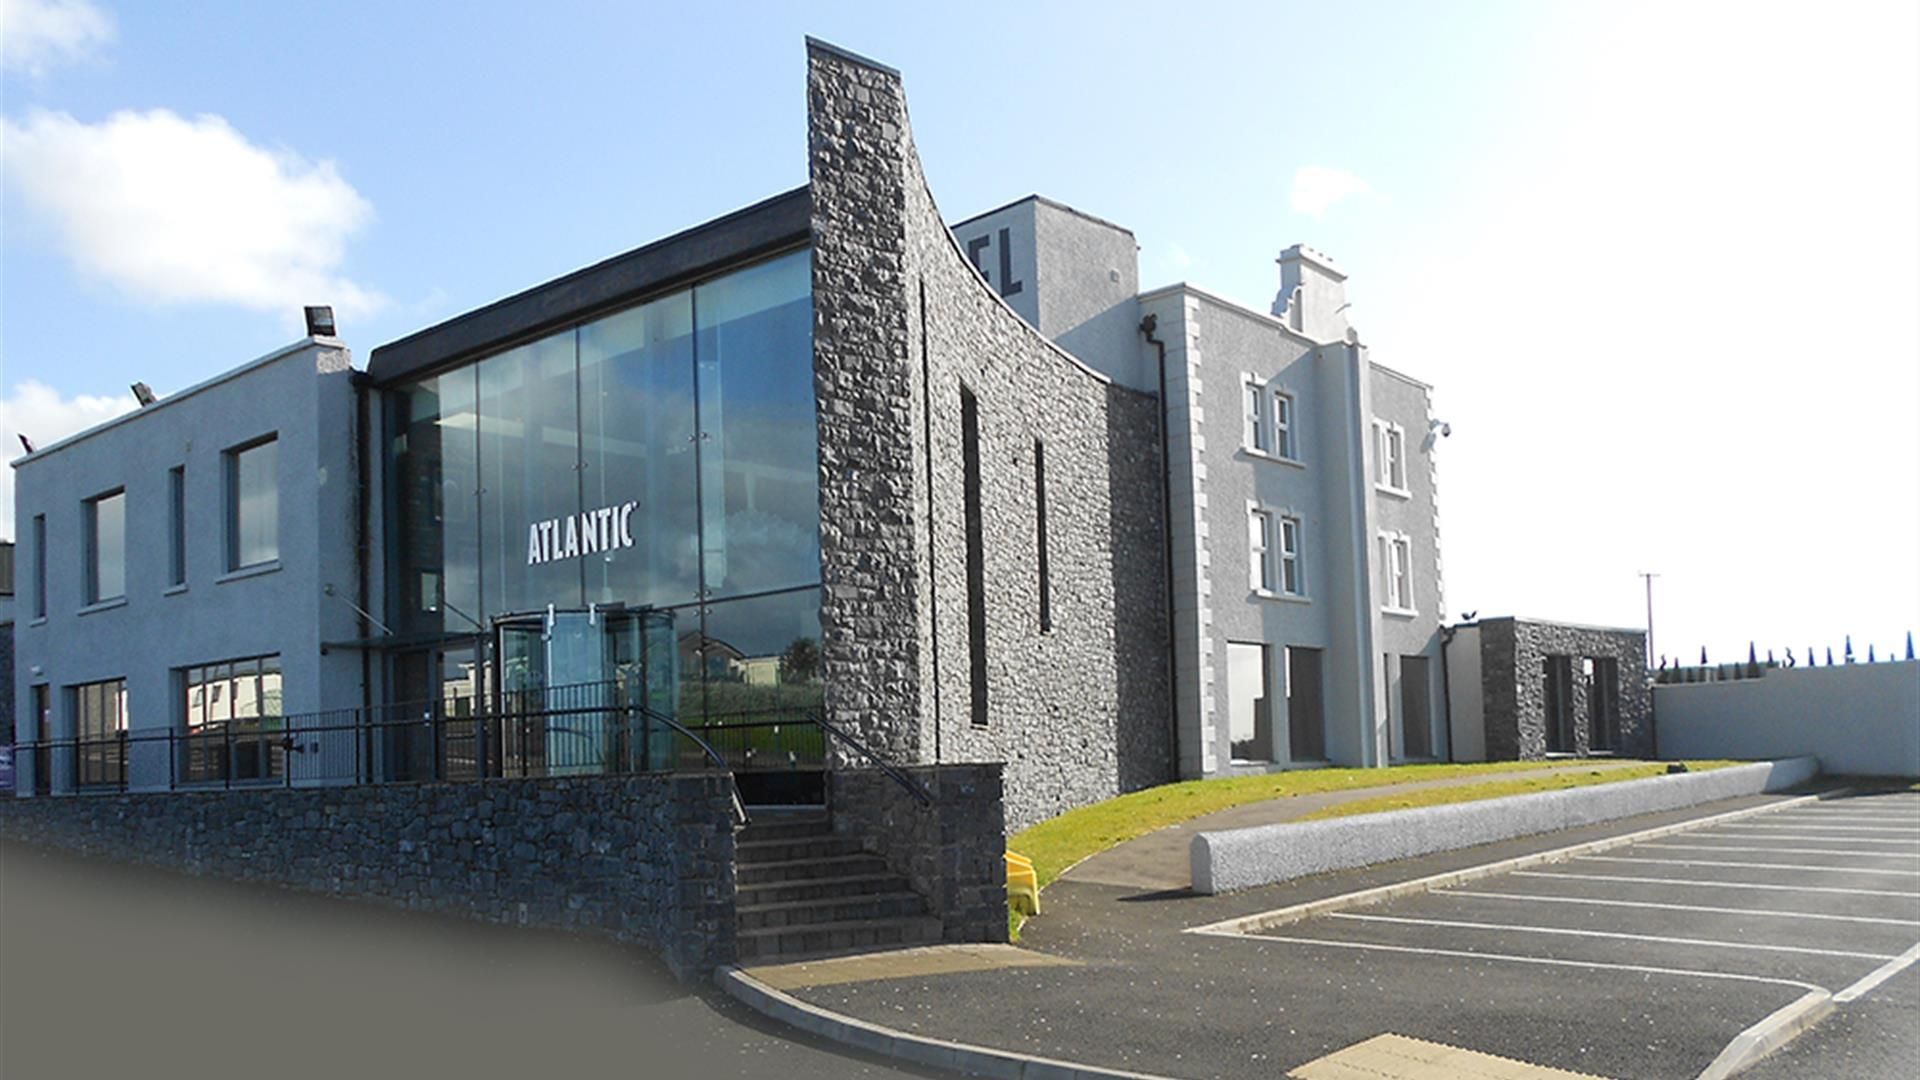 The Golflinks Hotel